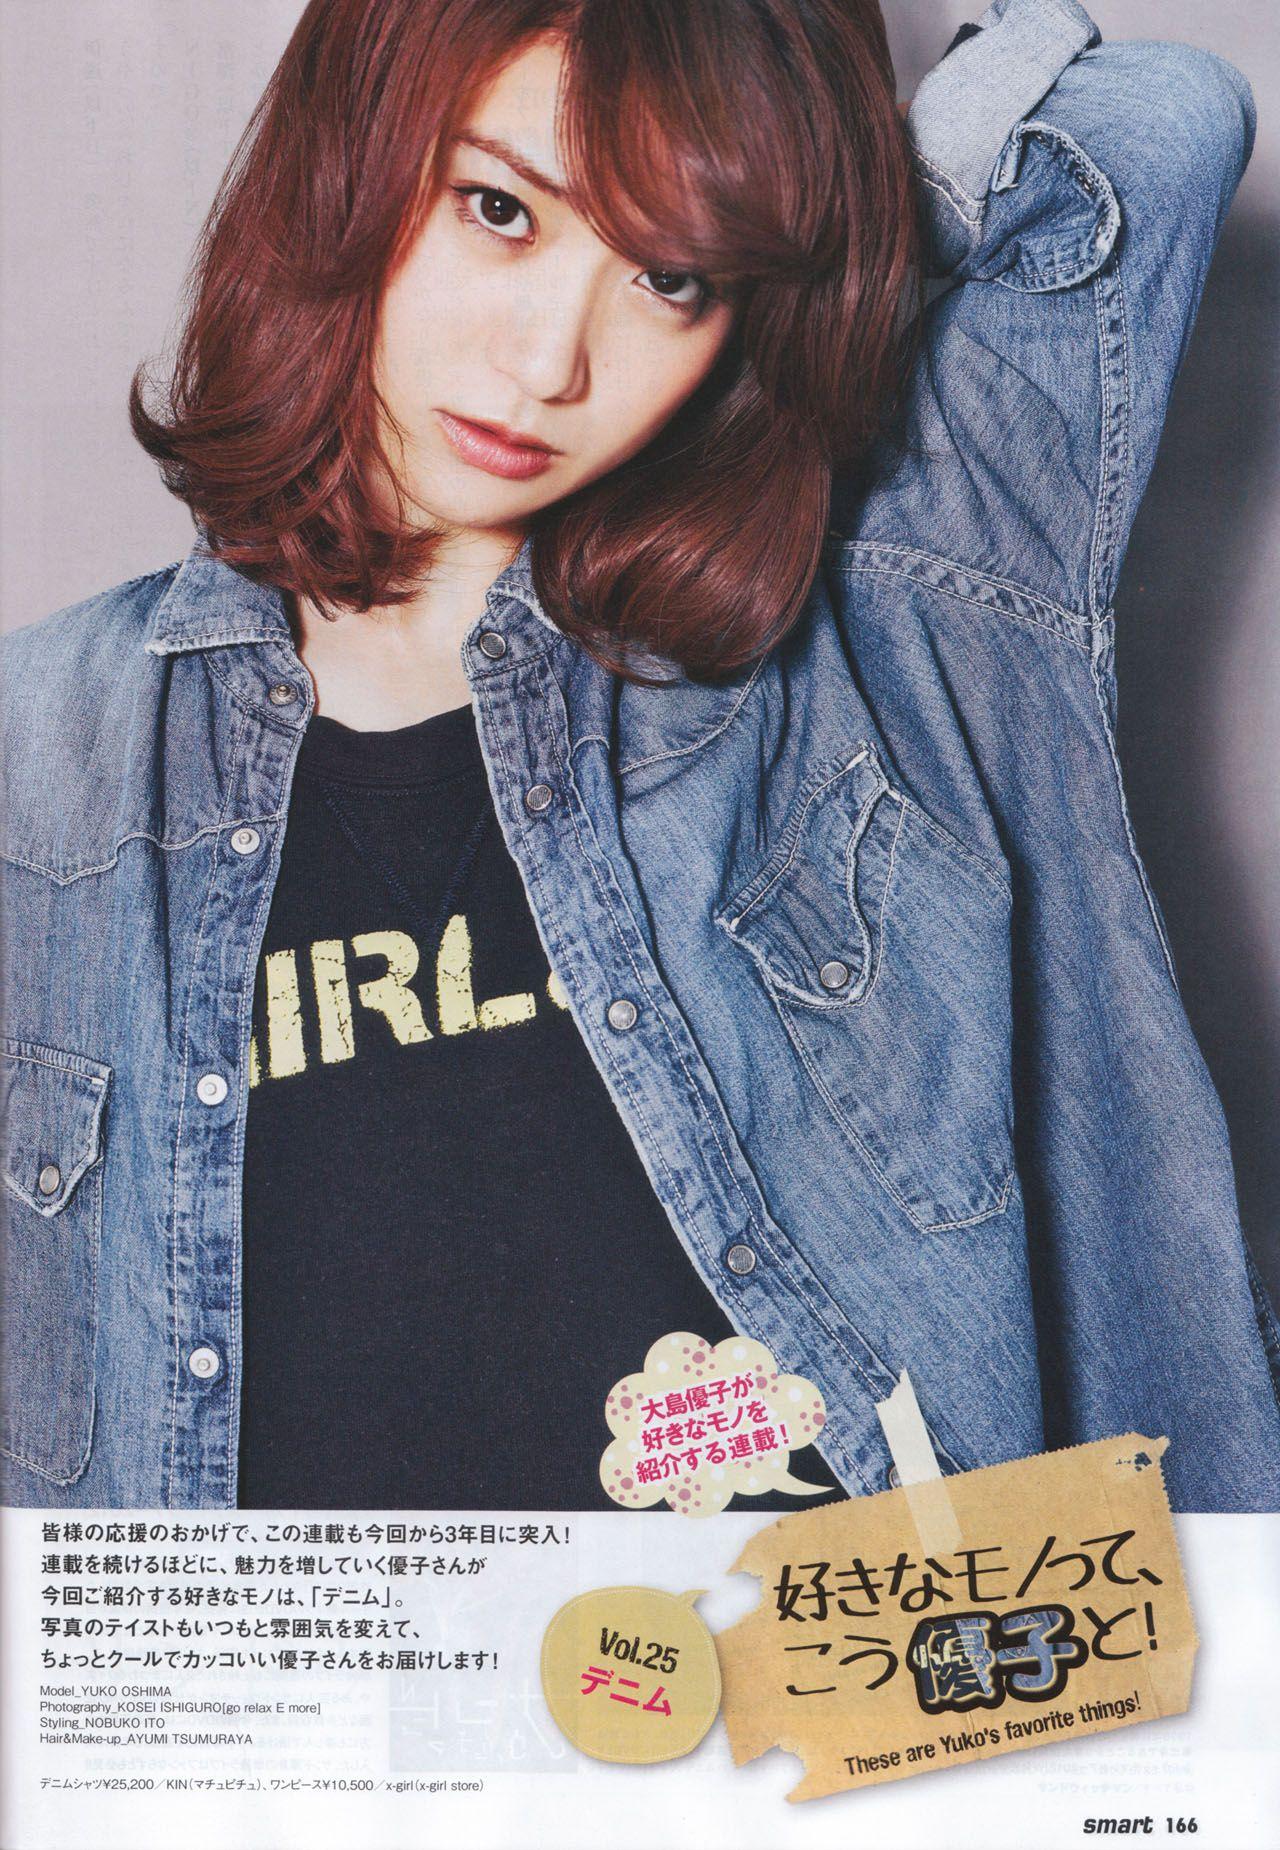 oshima yuko smart 2013年 4月号 akb48 lob hairstyle denim jacket fashion